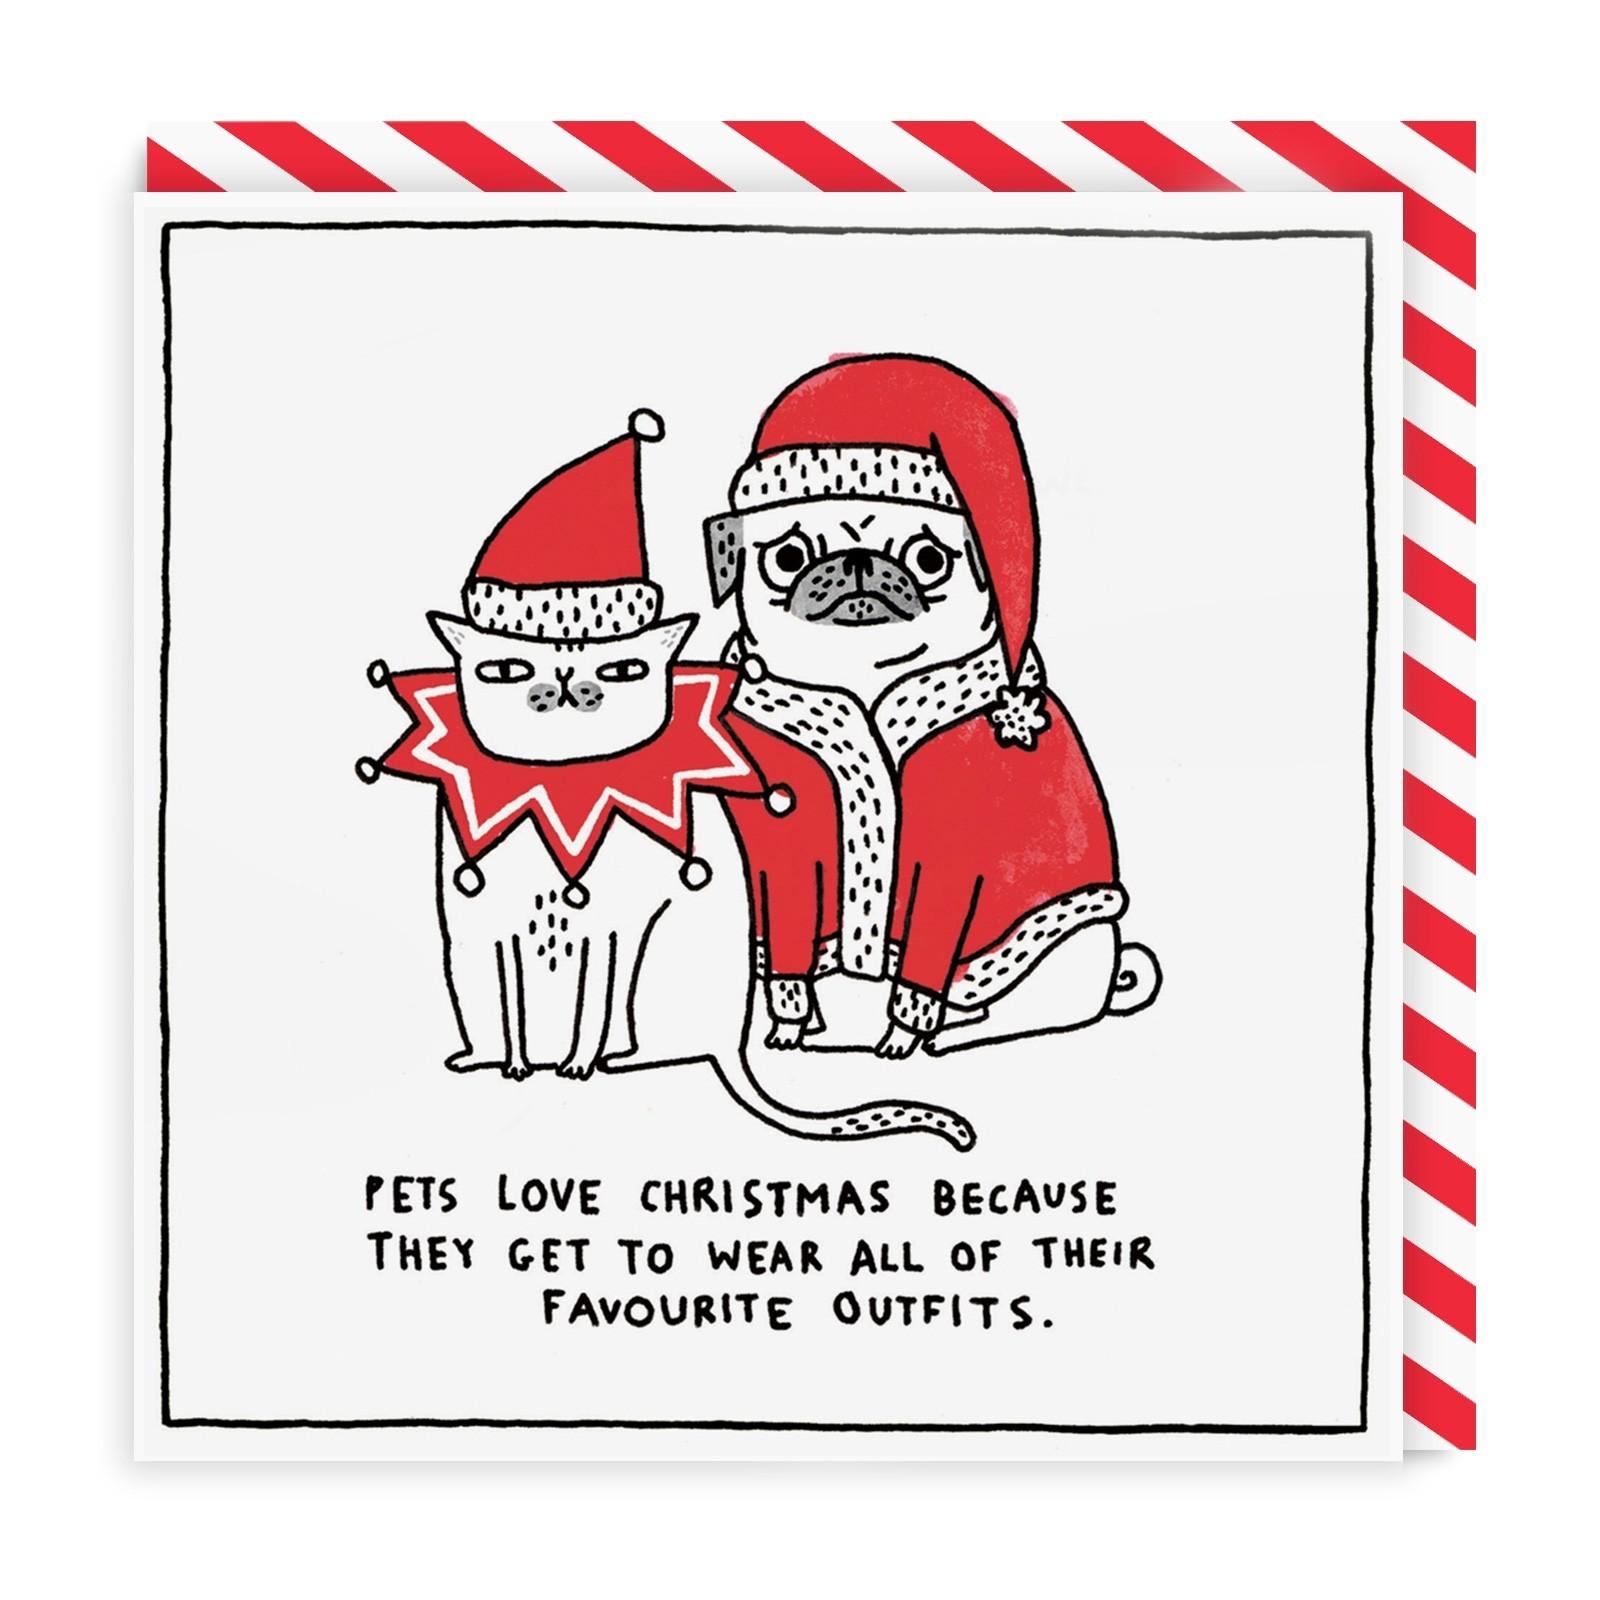 Christmas Cards - FurCats